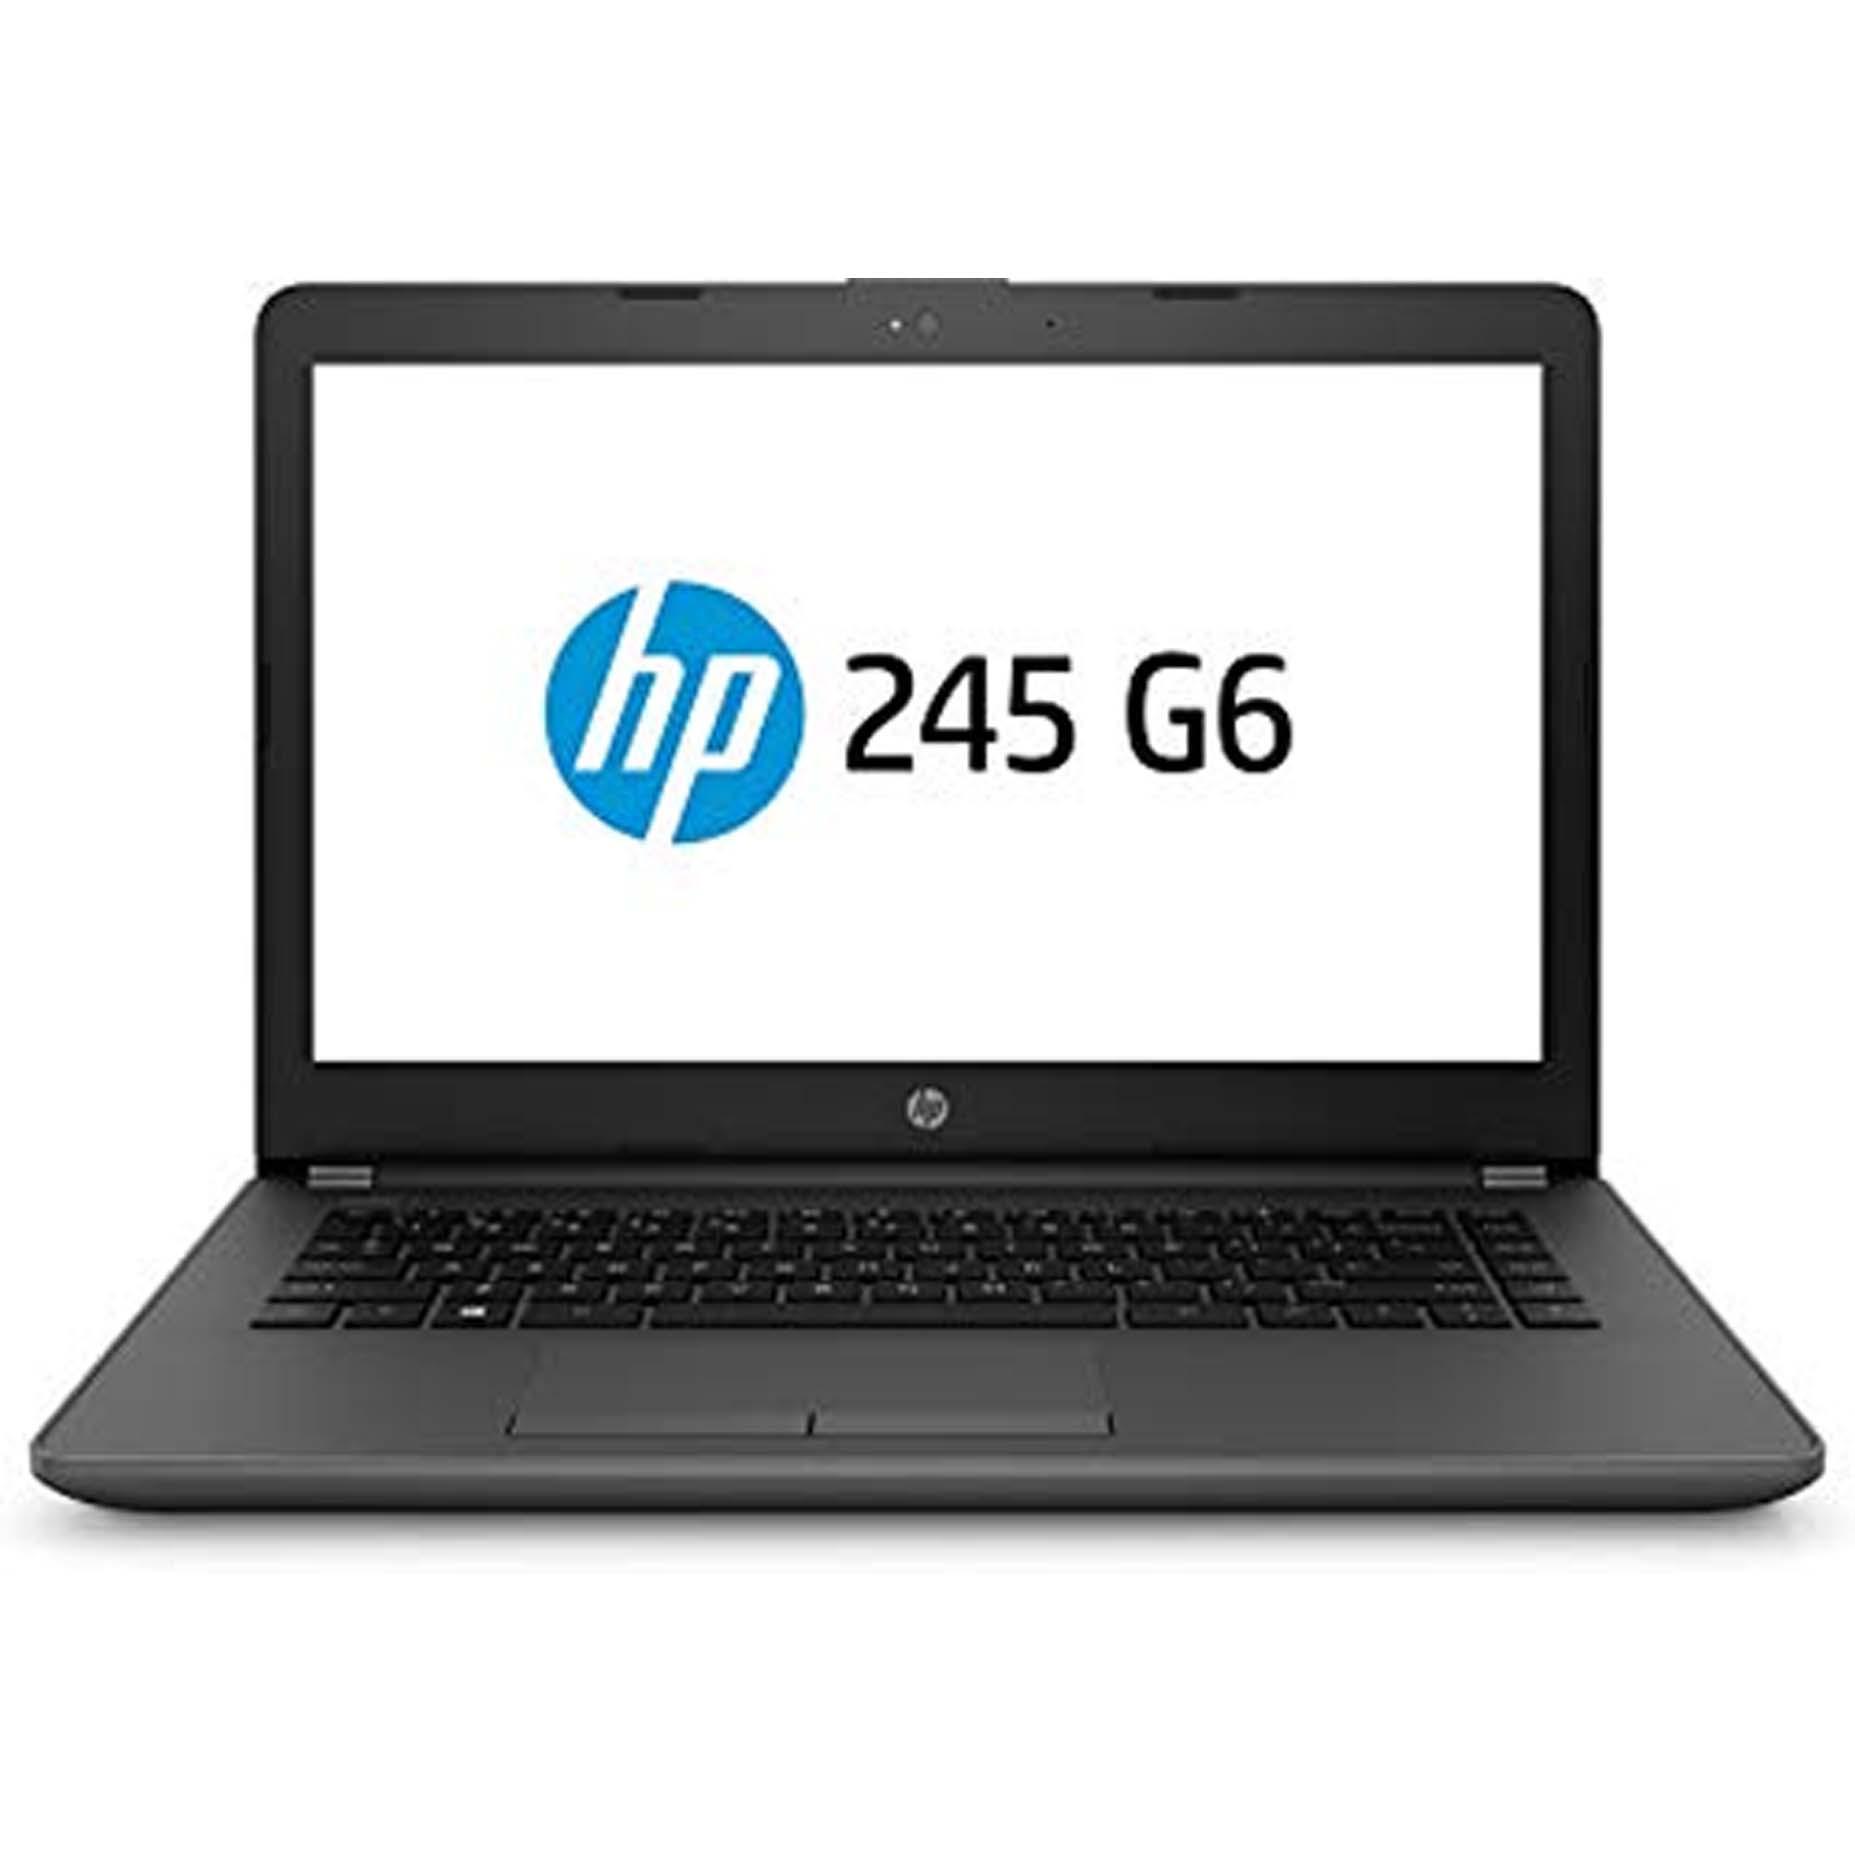 Harga HP Notebook 245 G6 2DF50PA AMD A9-9420 4GB 500GB Win10 14 Inch